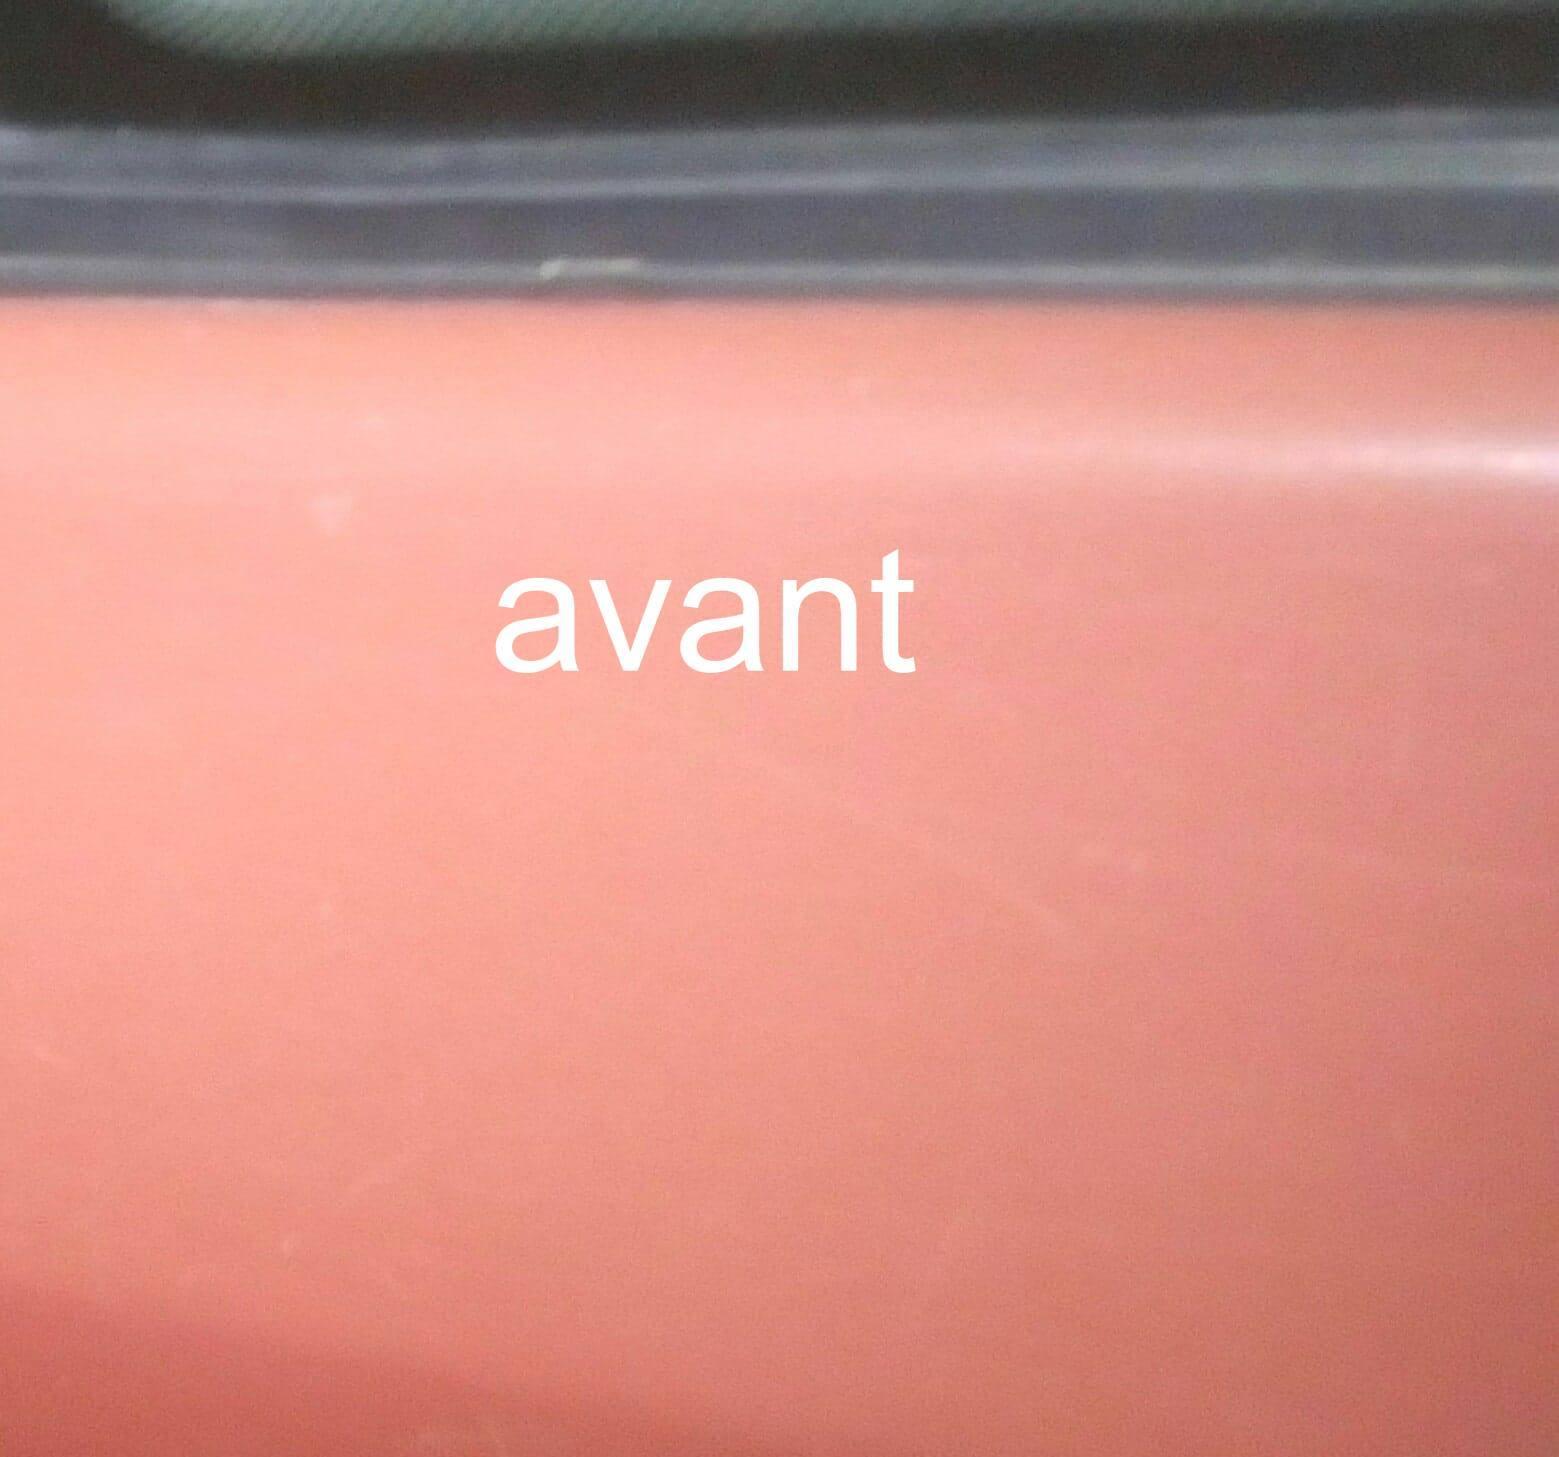 http://www.vivre-a-falvy.fr/medias/images/photo-5.jpg